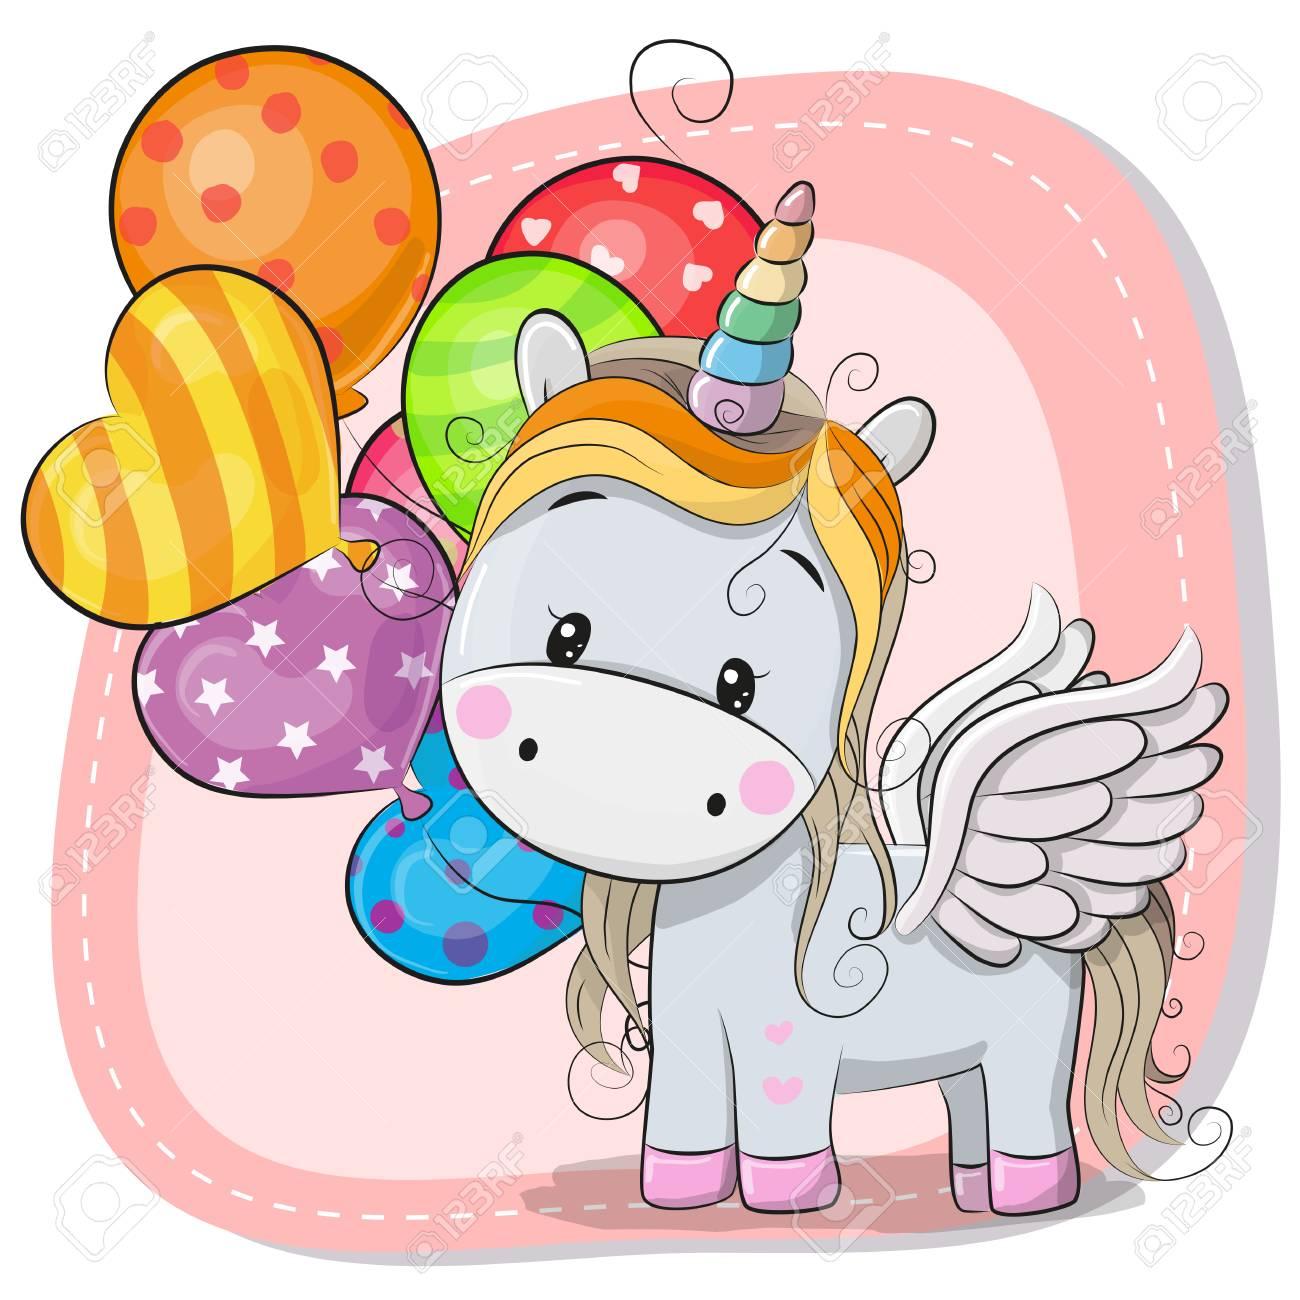 Greeting Card Cute Cartoon Unicorn With Balloon Royalty Free ...